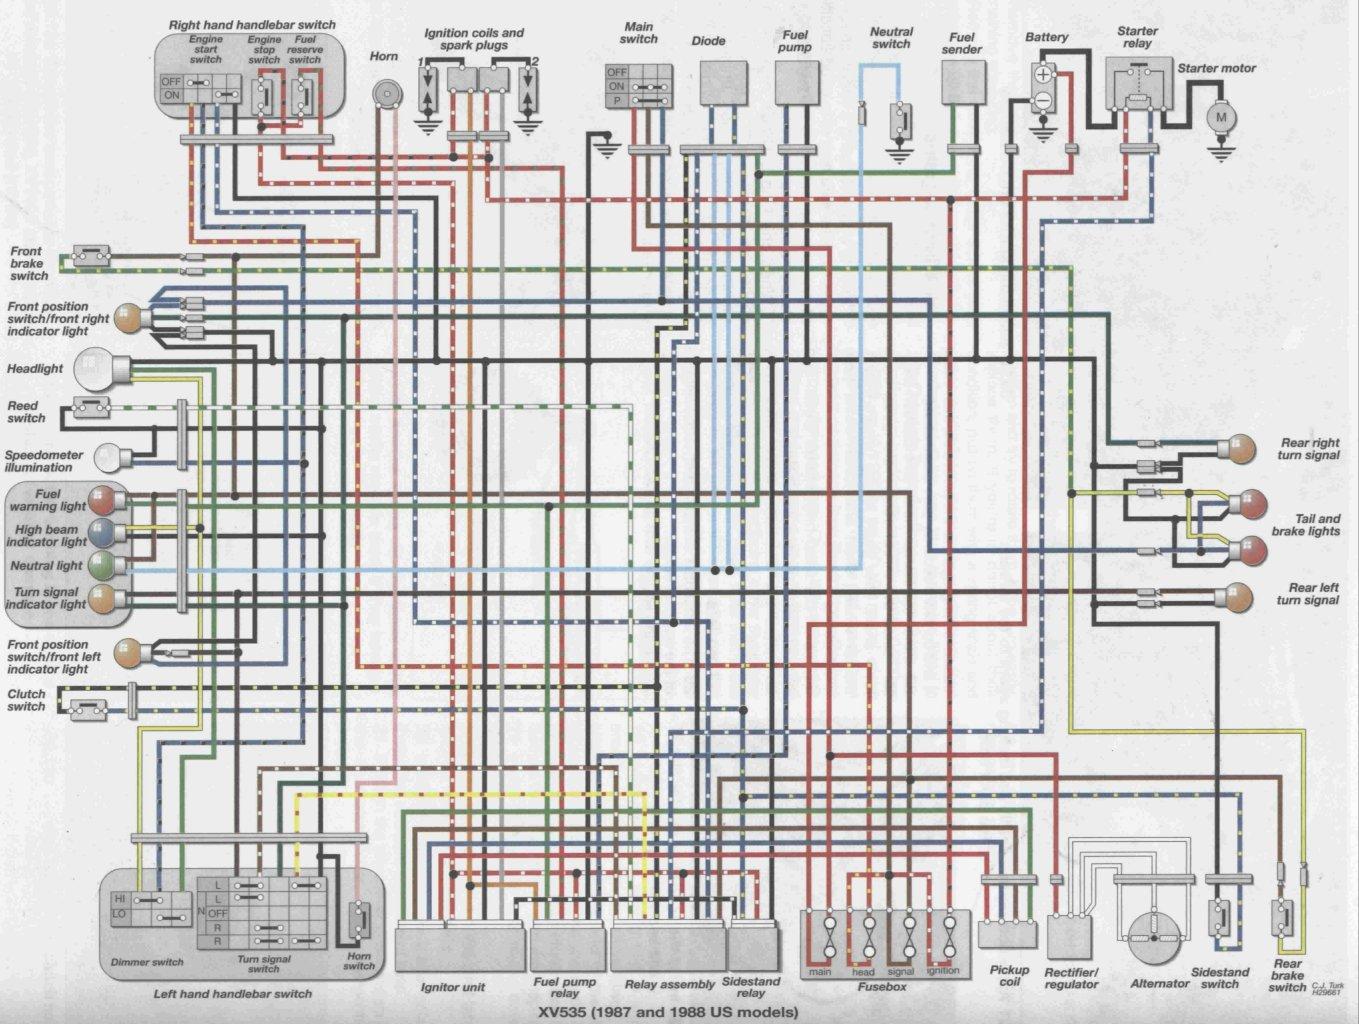 cbr1100xx wiring diagram - 69 mustang alternator wiring diagram schematic -  keys-can-acces.tukune.jeanjaures37.fr  wiring diagram resource